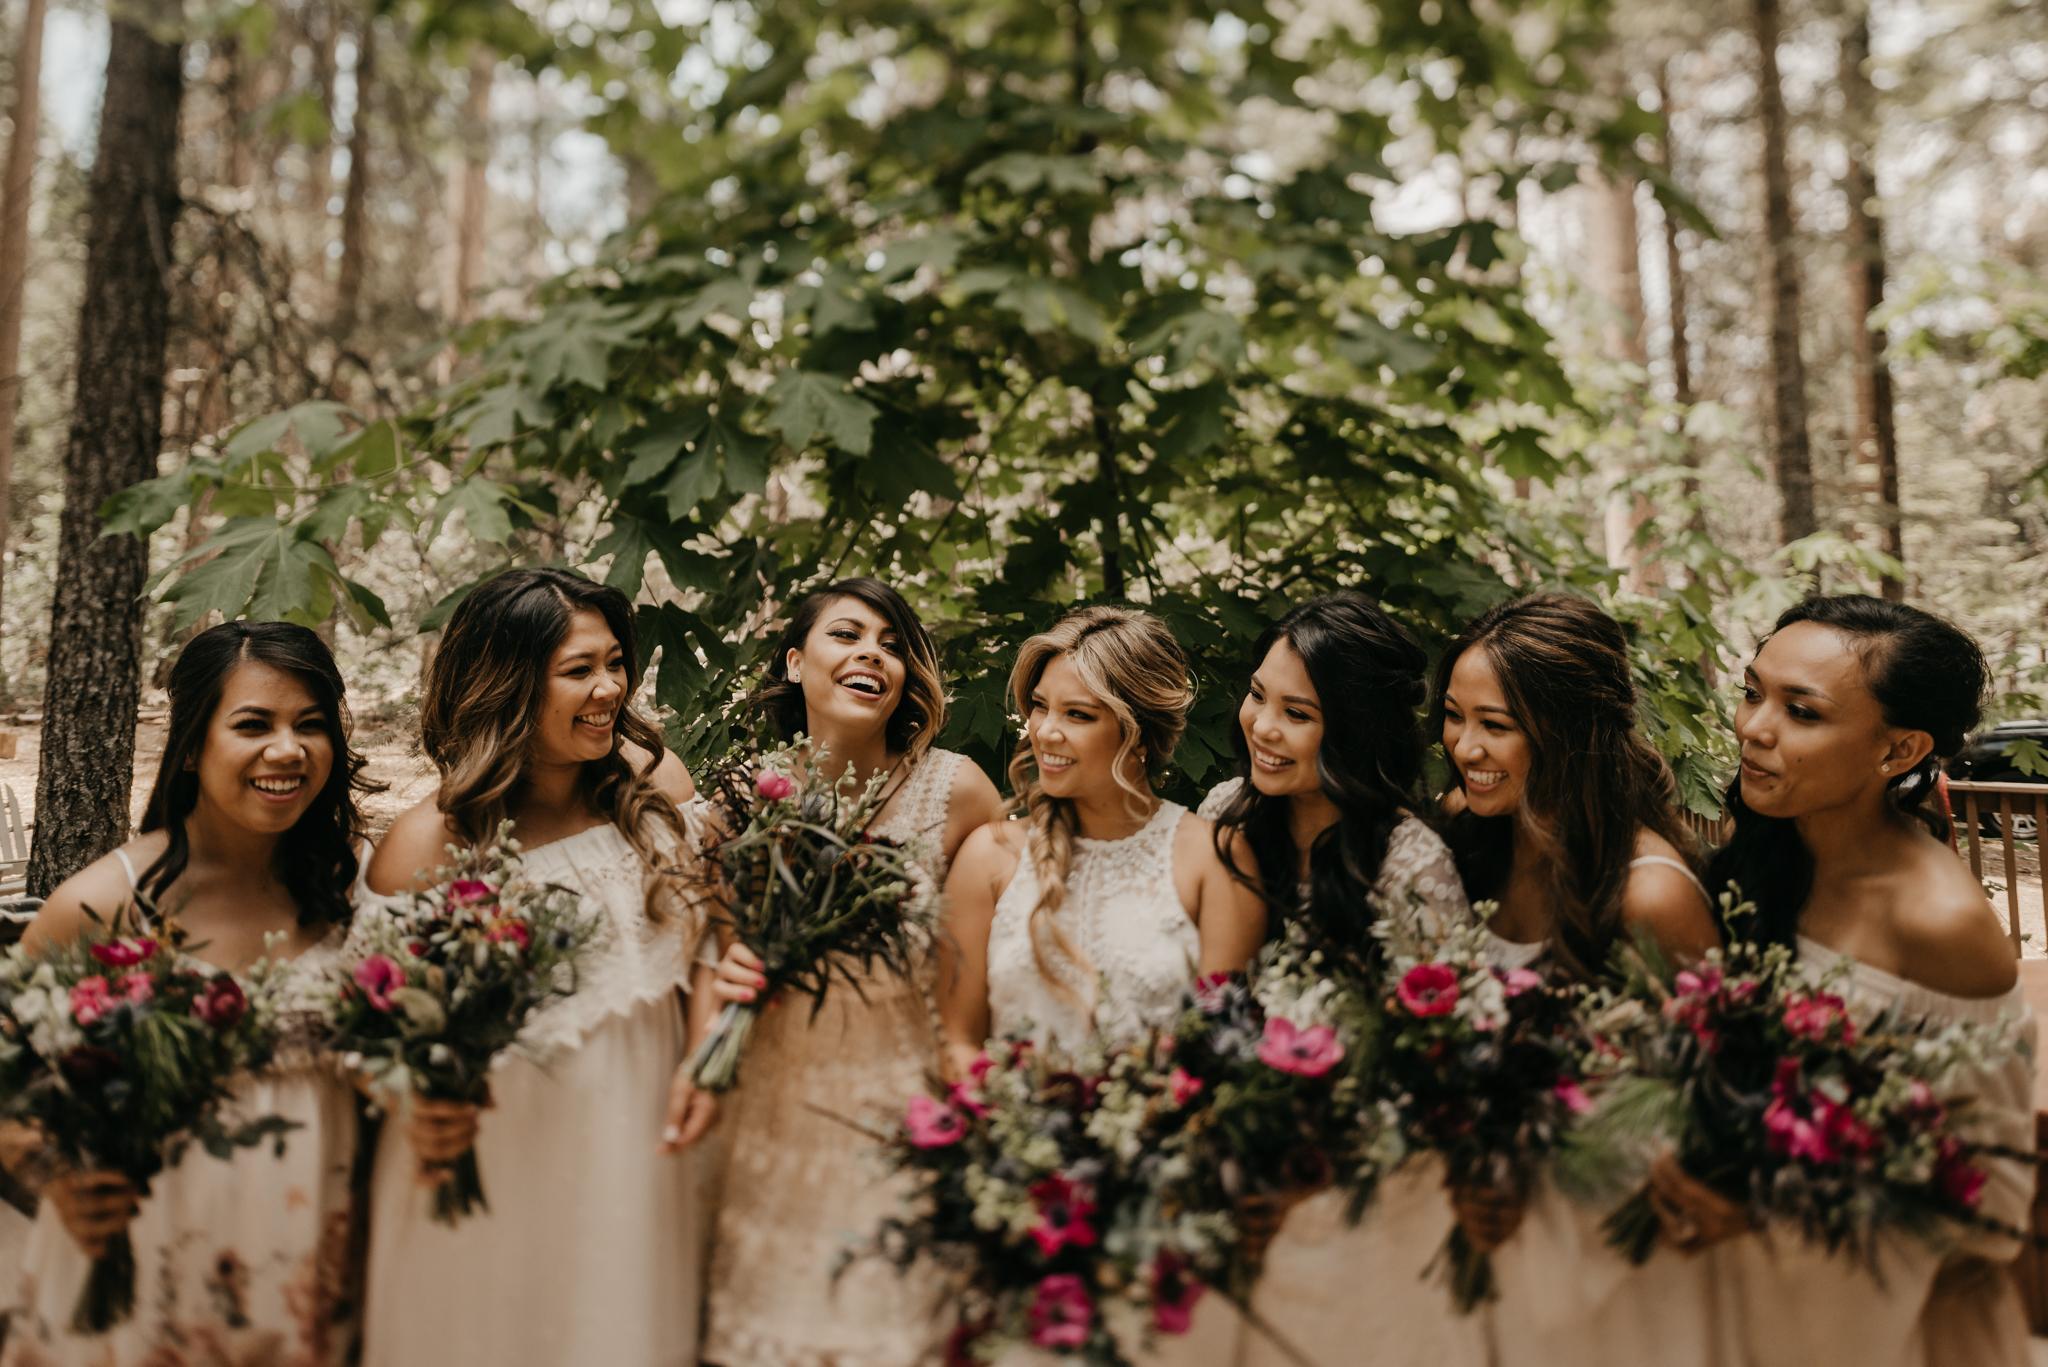 © Isaiah + Taylor Photography - Evergreen Lodge Destination Yoesmite Wedding - Los Angeles Wedding Photographer-049.jpg